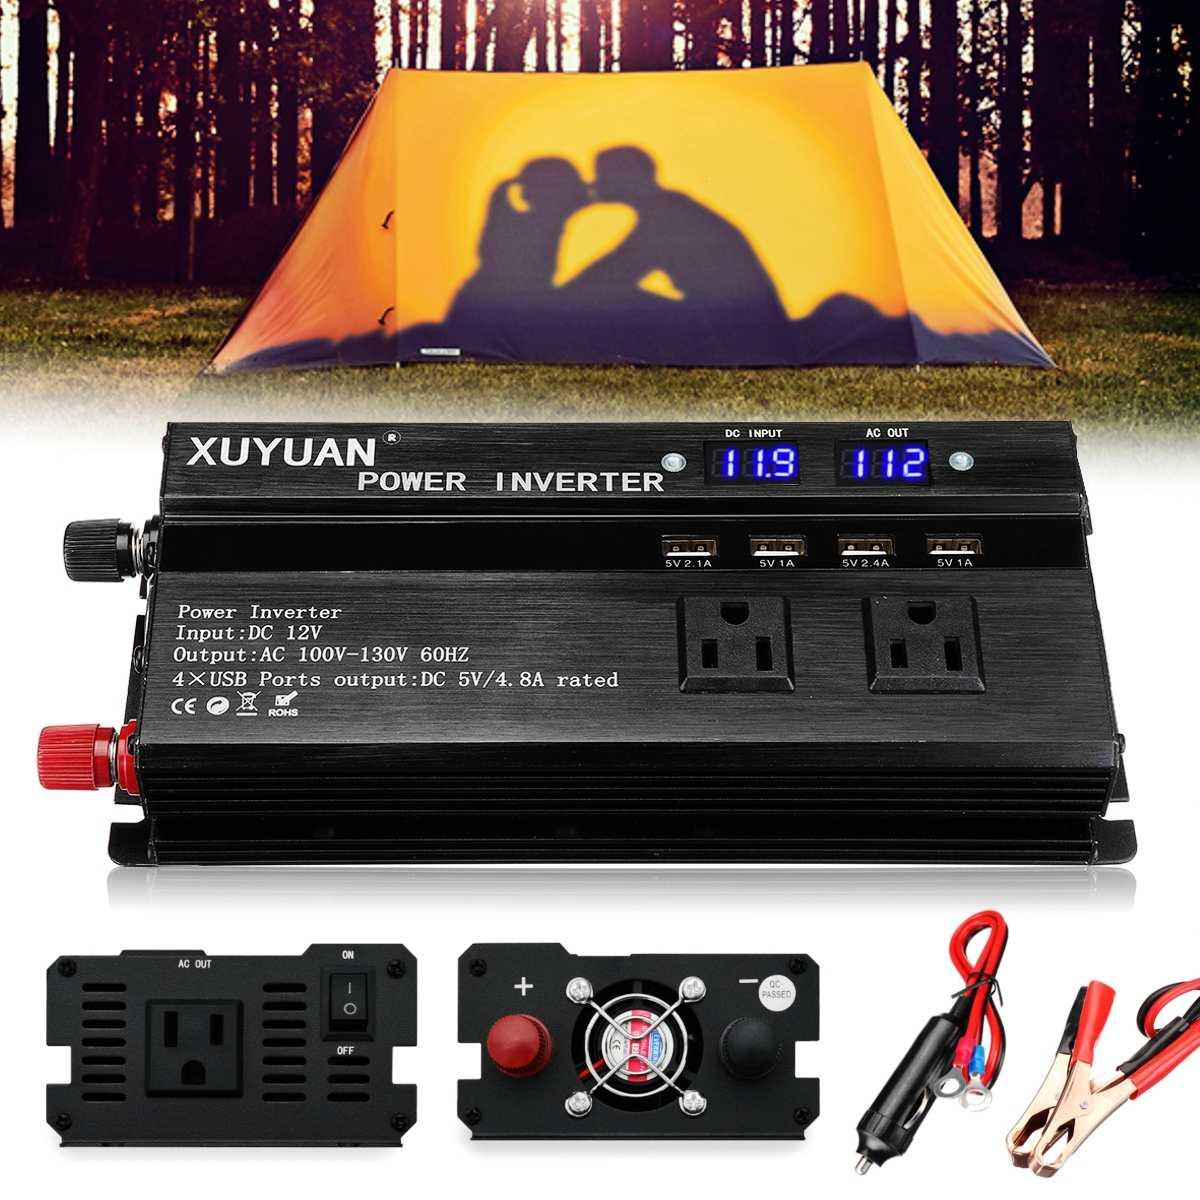 Auto Inverter 12V 220V 1500W Pea Power Inverter Spannung Transformator Konverter 12 220 Ladegerät Solar Inversor 12V 220V LCD Display